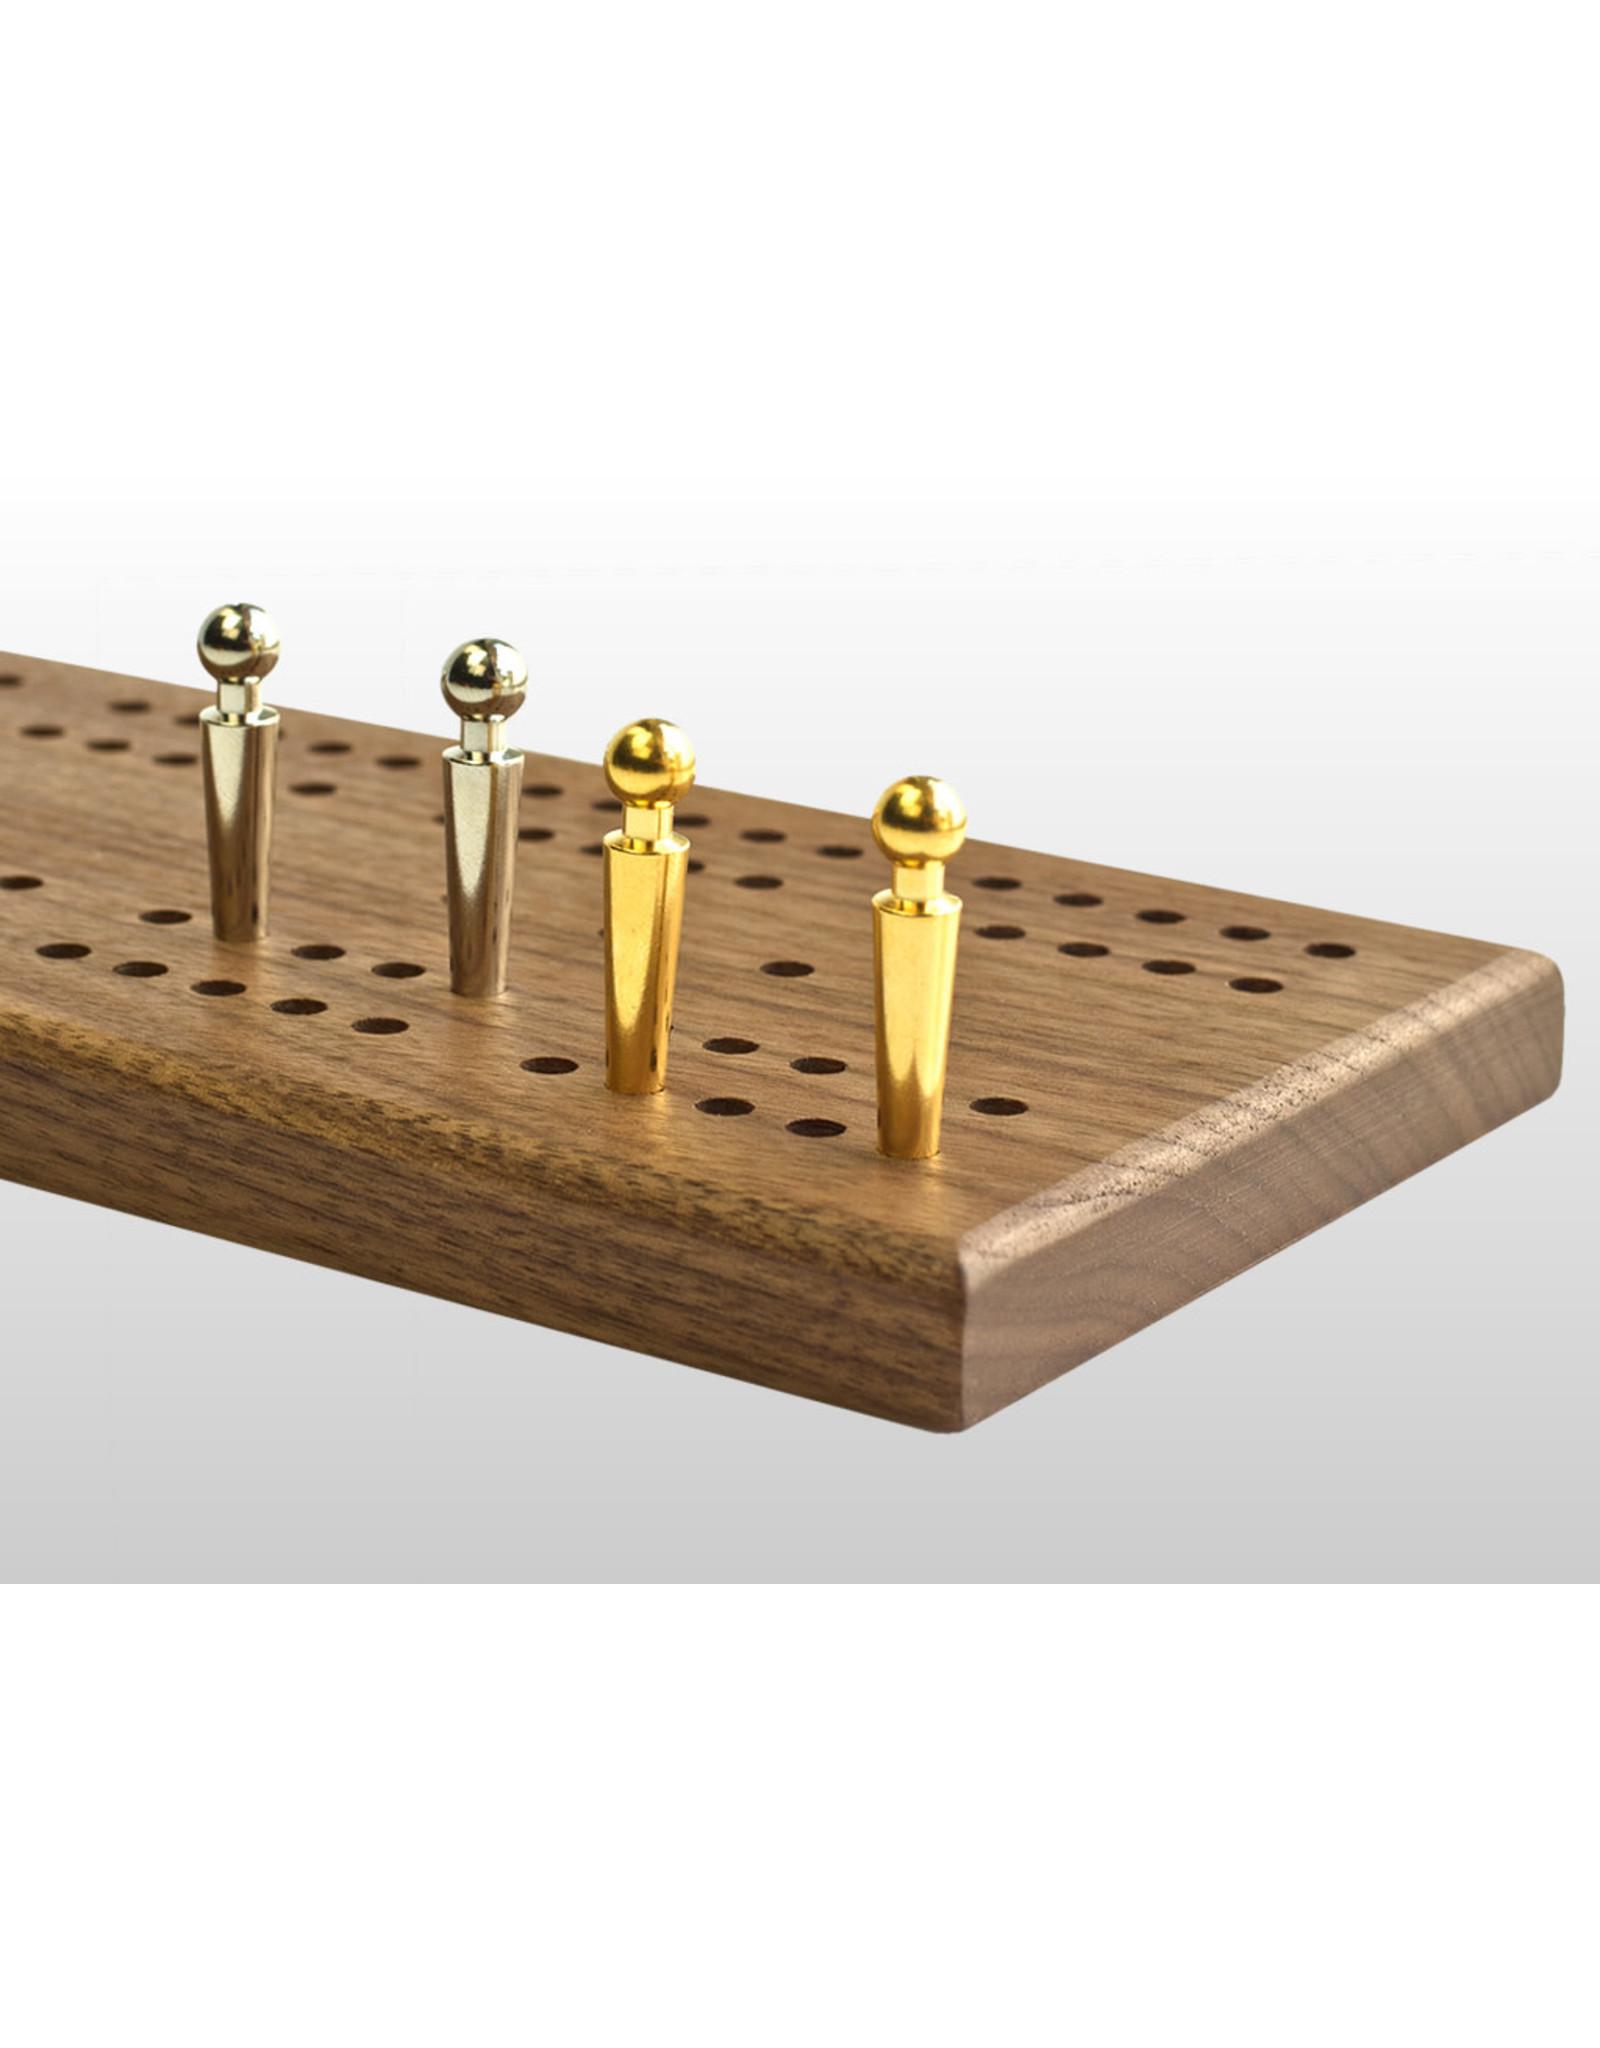 Alex Cramer Co. Club Size Cribbage Board